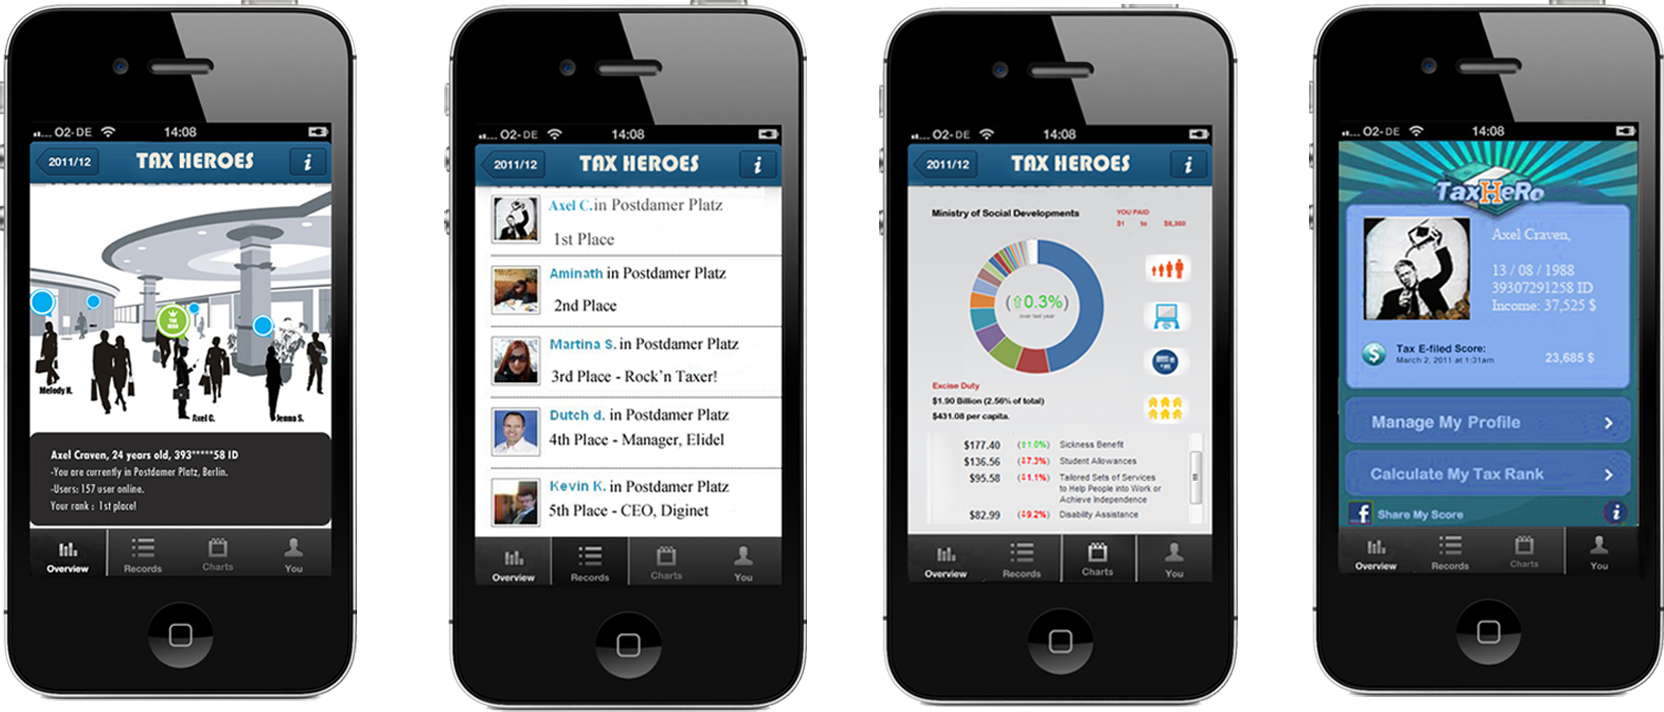 Tax Hero App